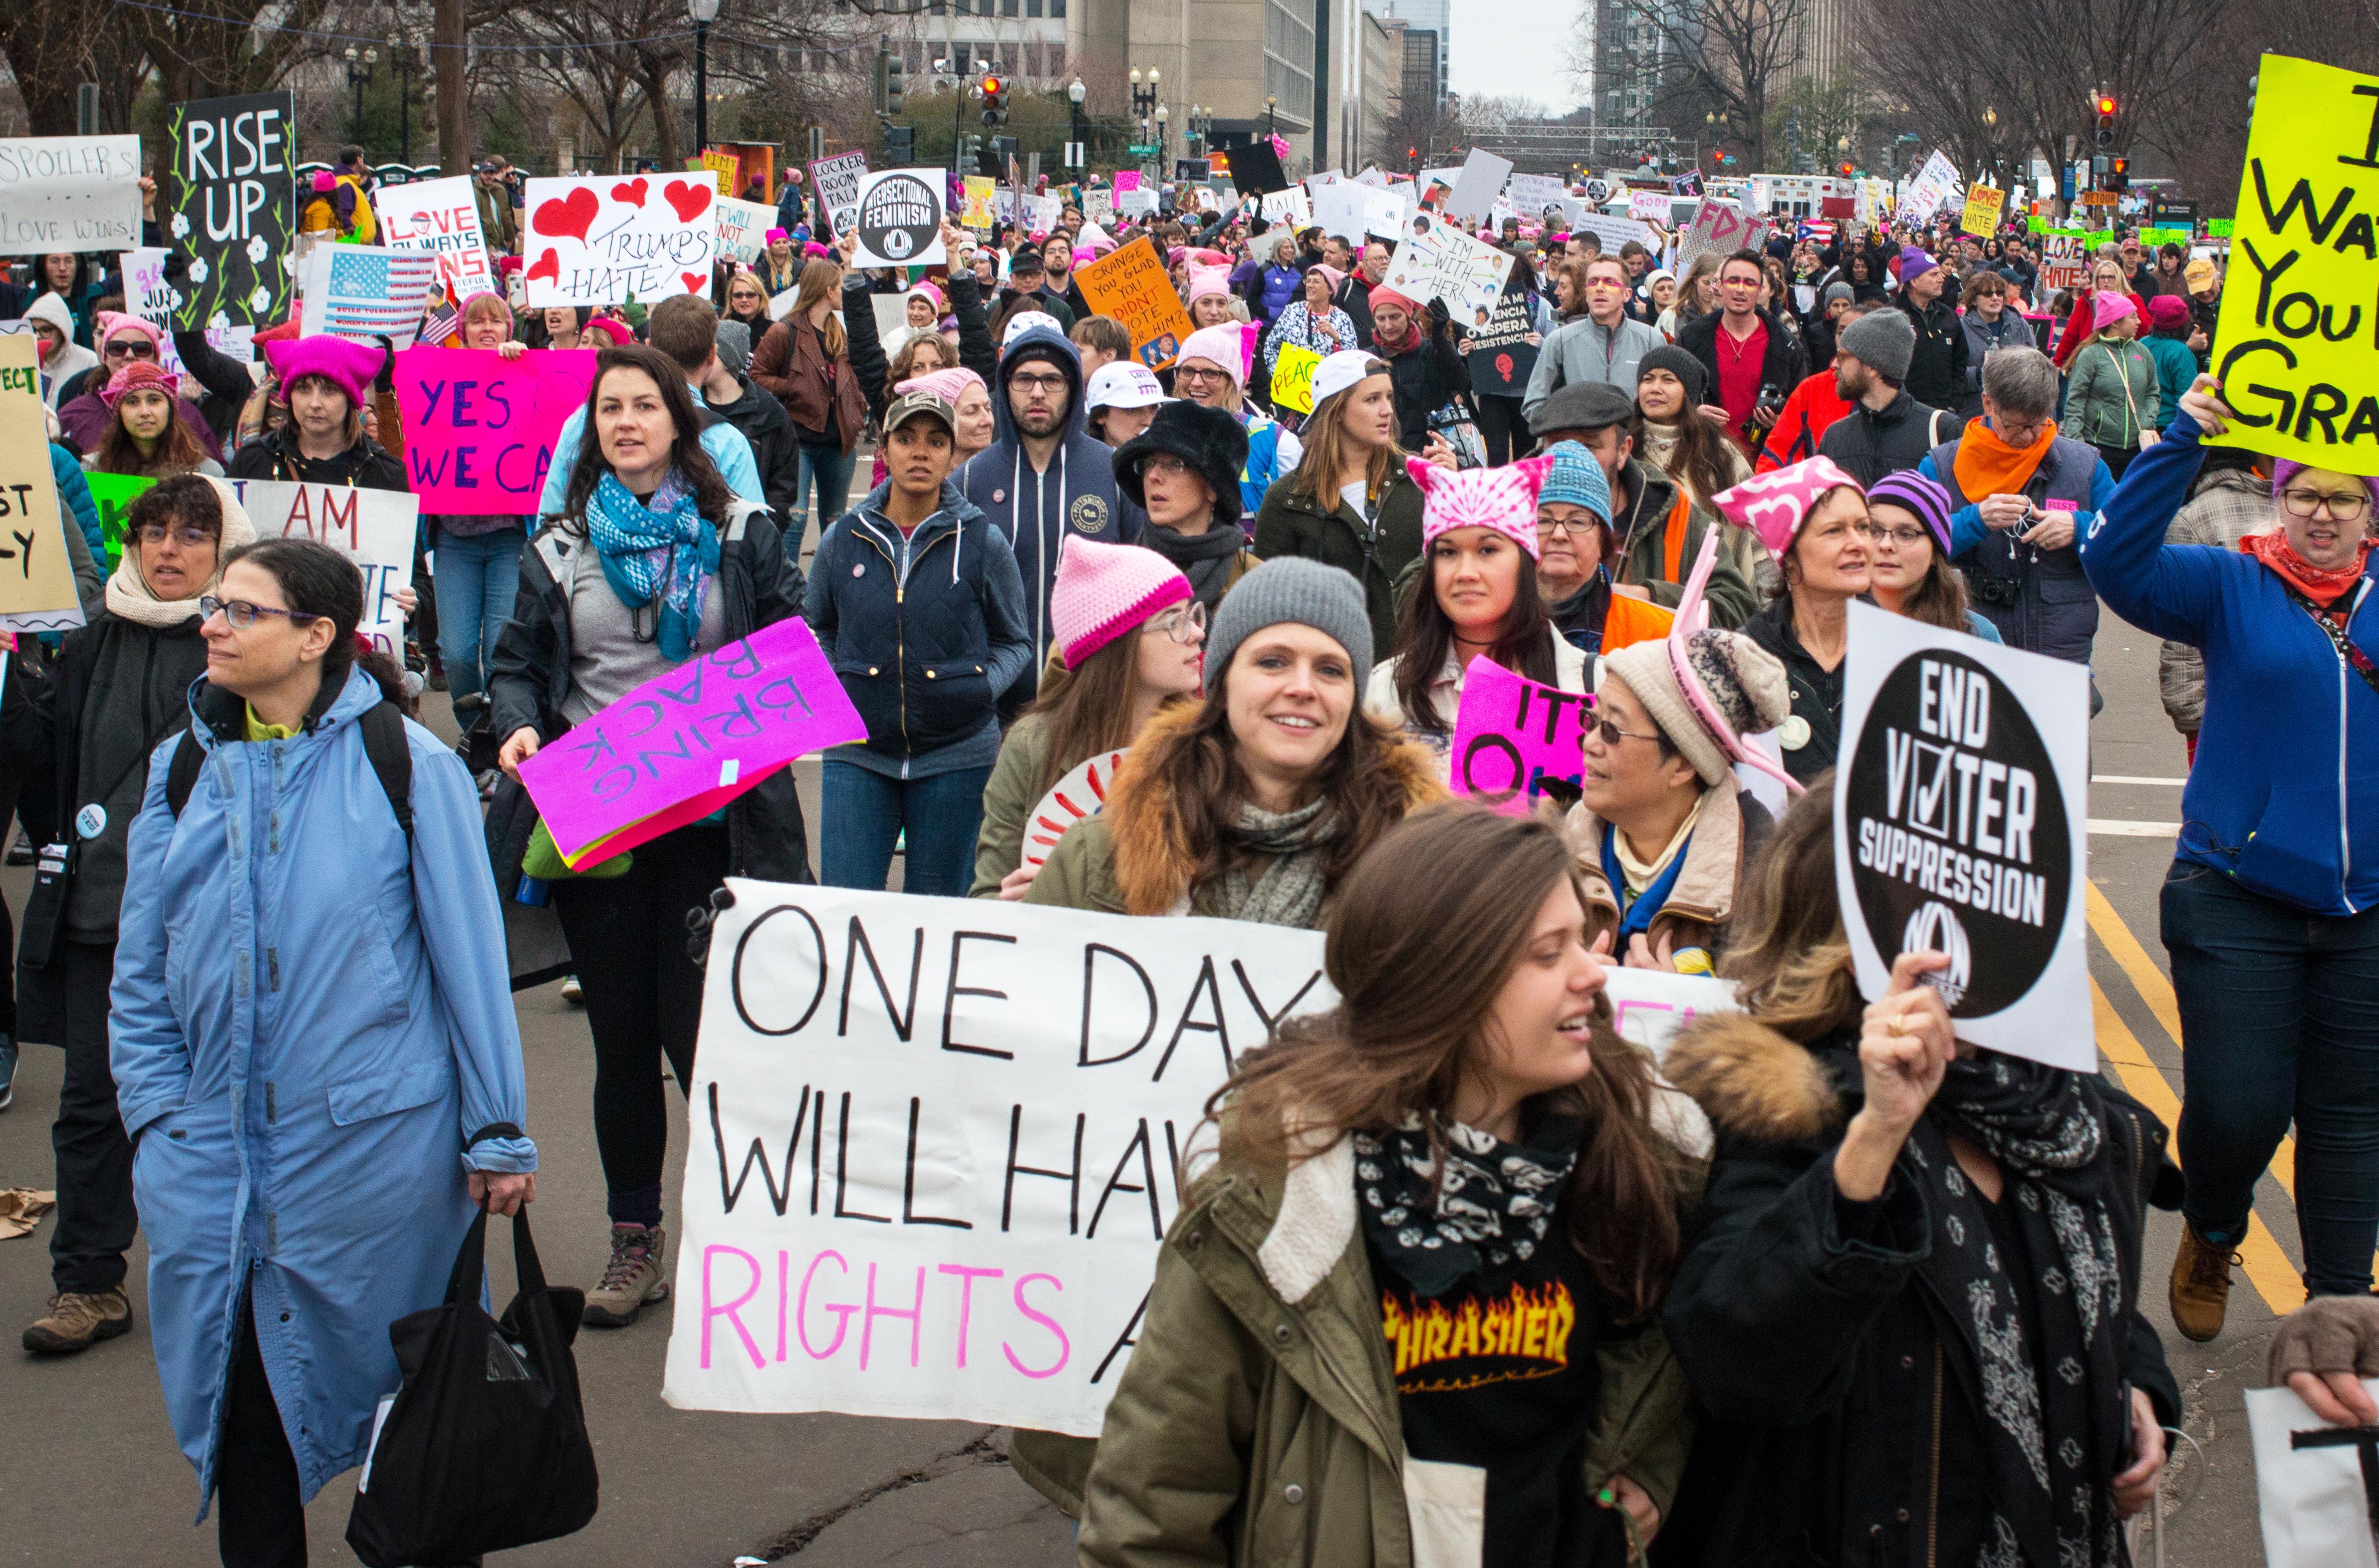 web-us-washington-womens-march-liz-lemon-cc